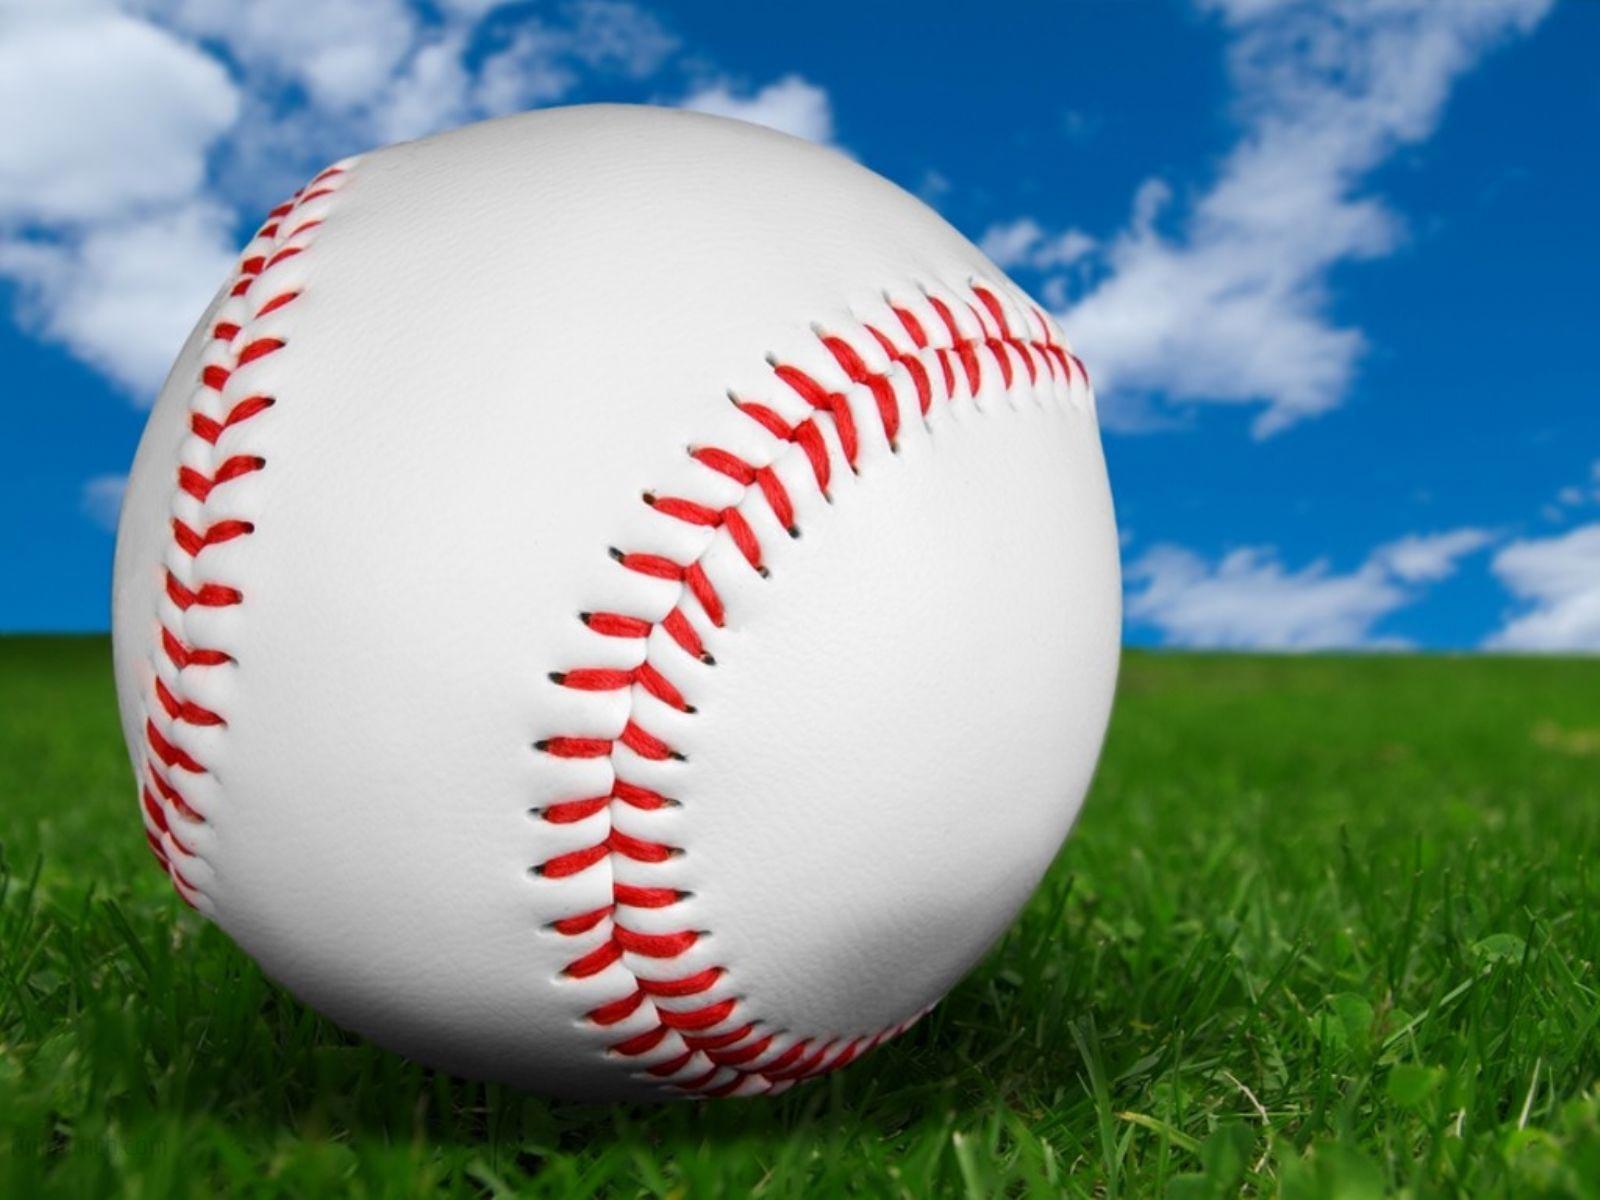 baseball wallpapers baseball wallpapers baseball wallpapers baseball 1600x1200